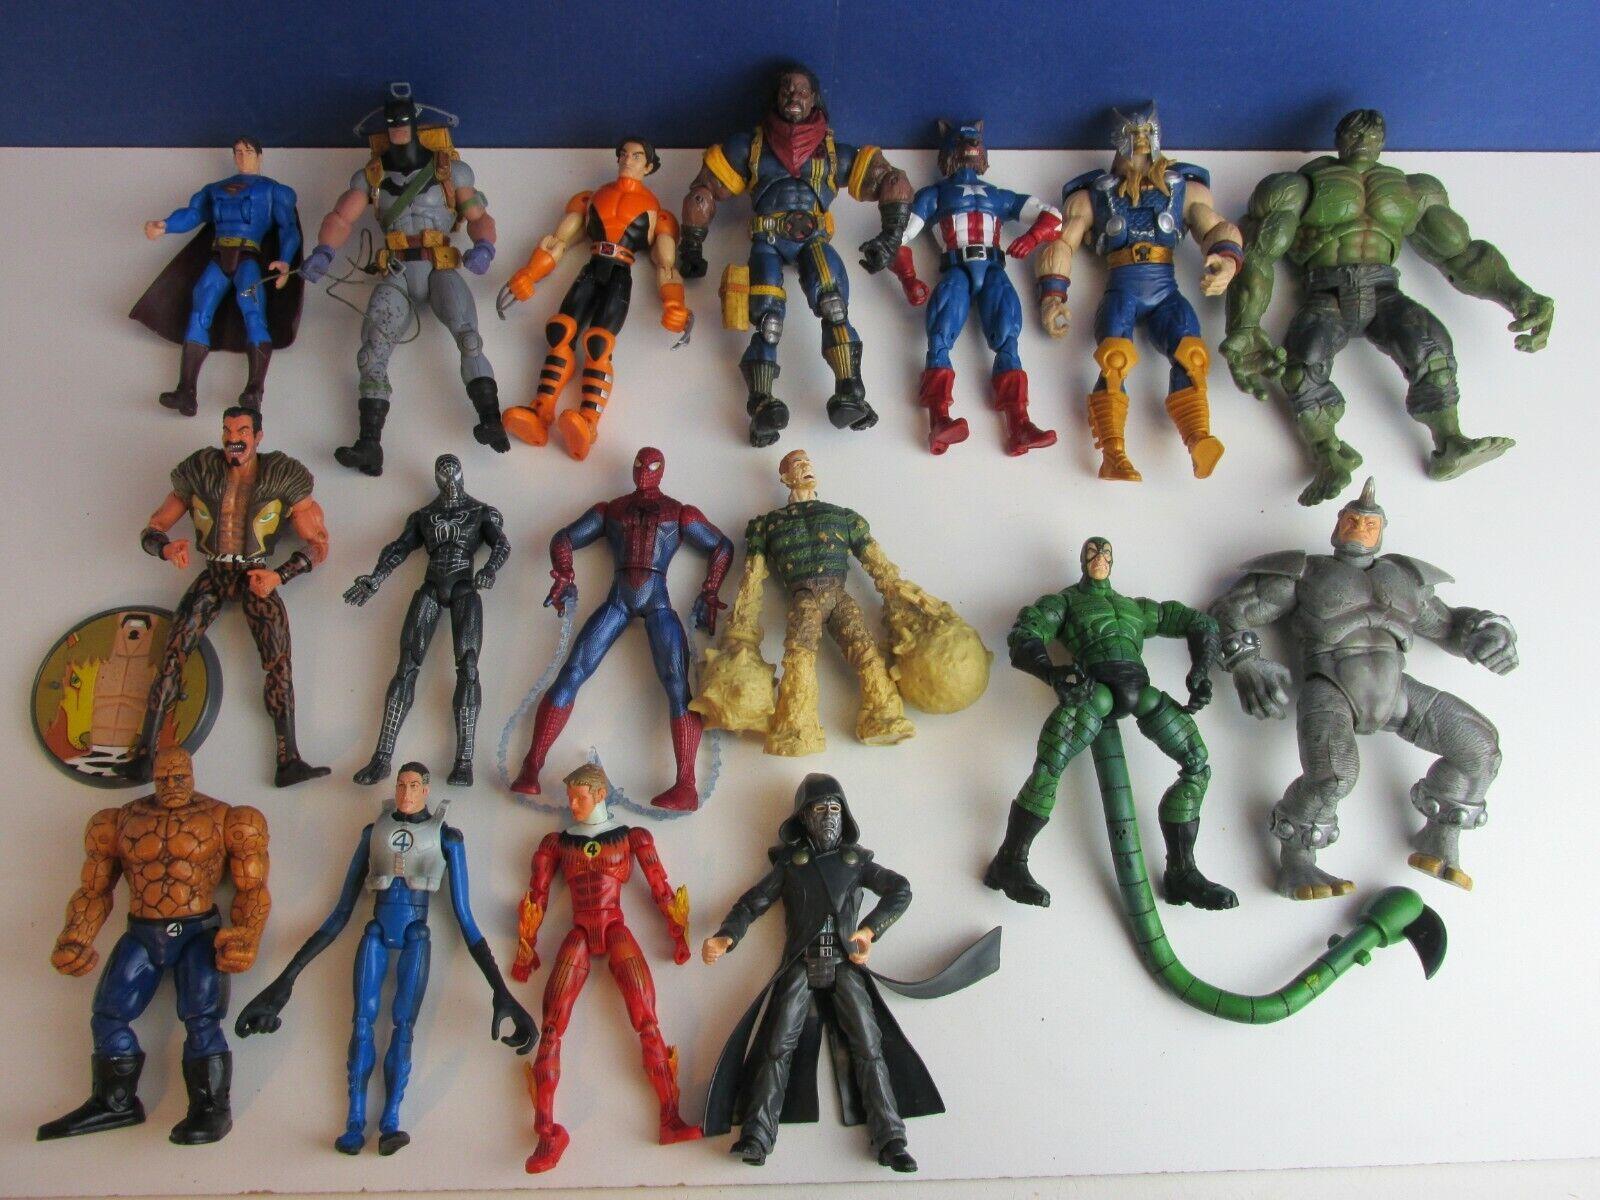 17 super hero ACTION FIGURE 7  LOT batman hulk thor ff4 rhino DC MARVEL set